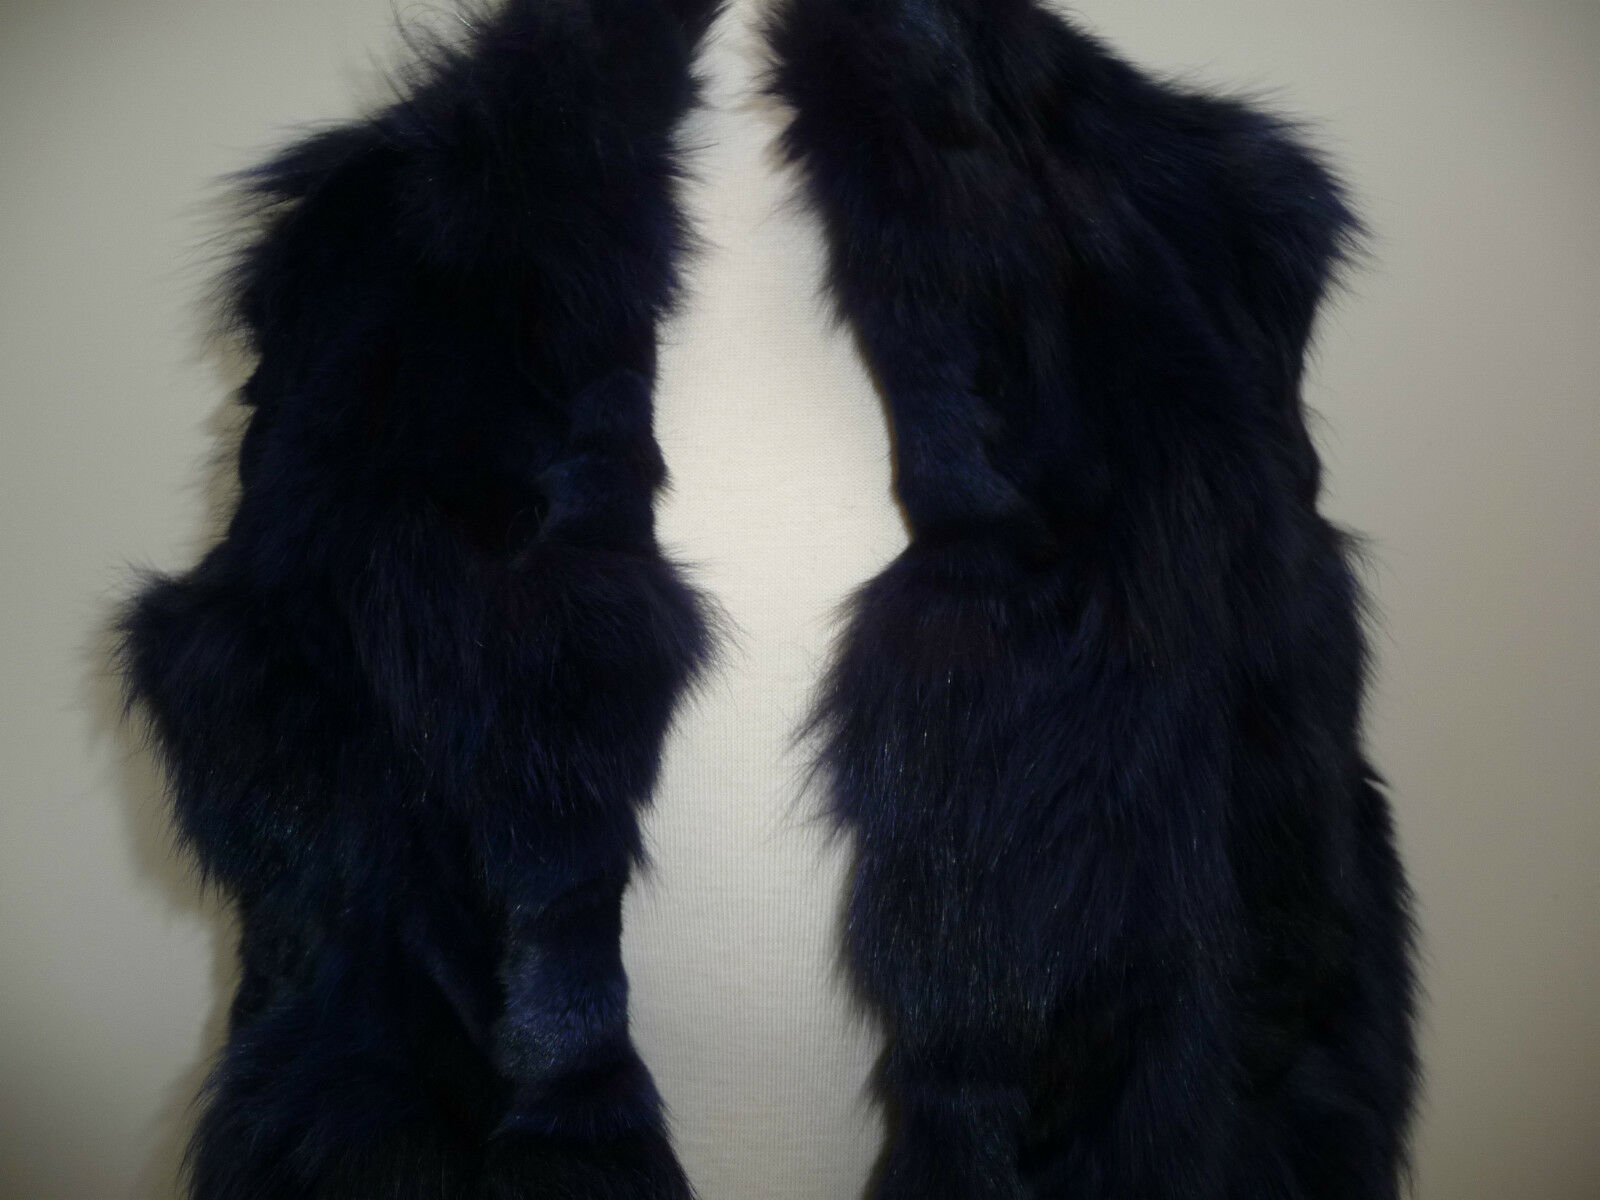 Jocelyn Bicolor Black Navy Roadie Fox Fur Vest New $1.1 image 6